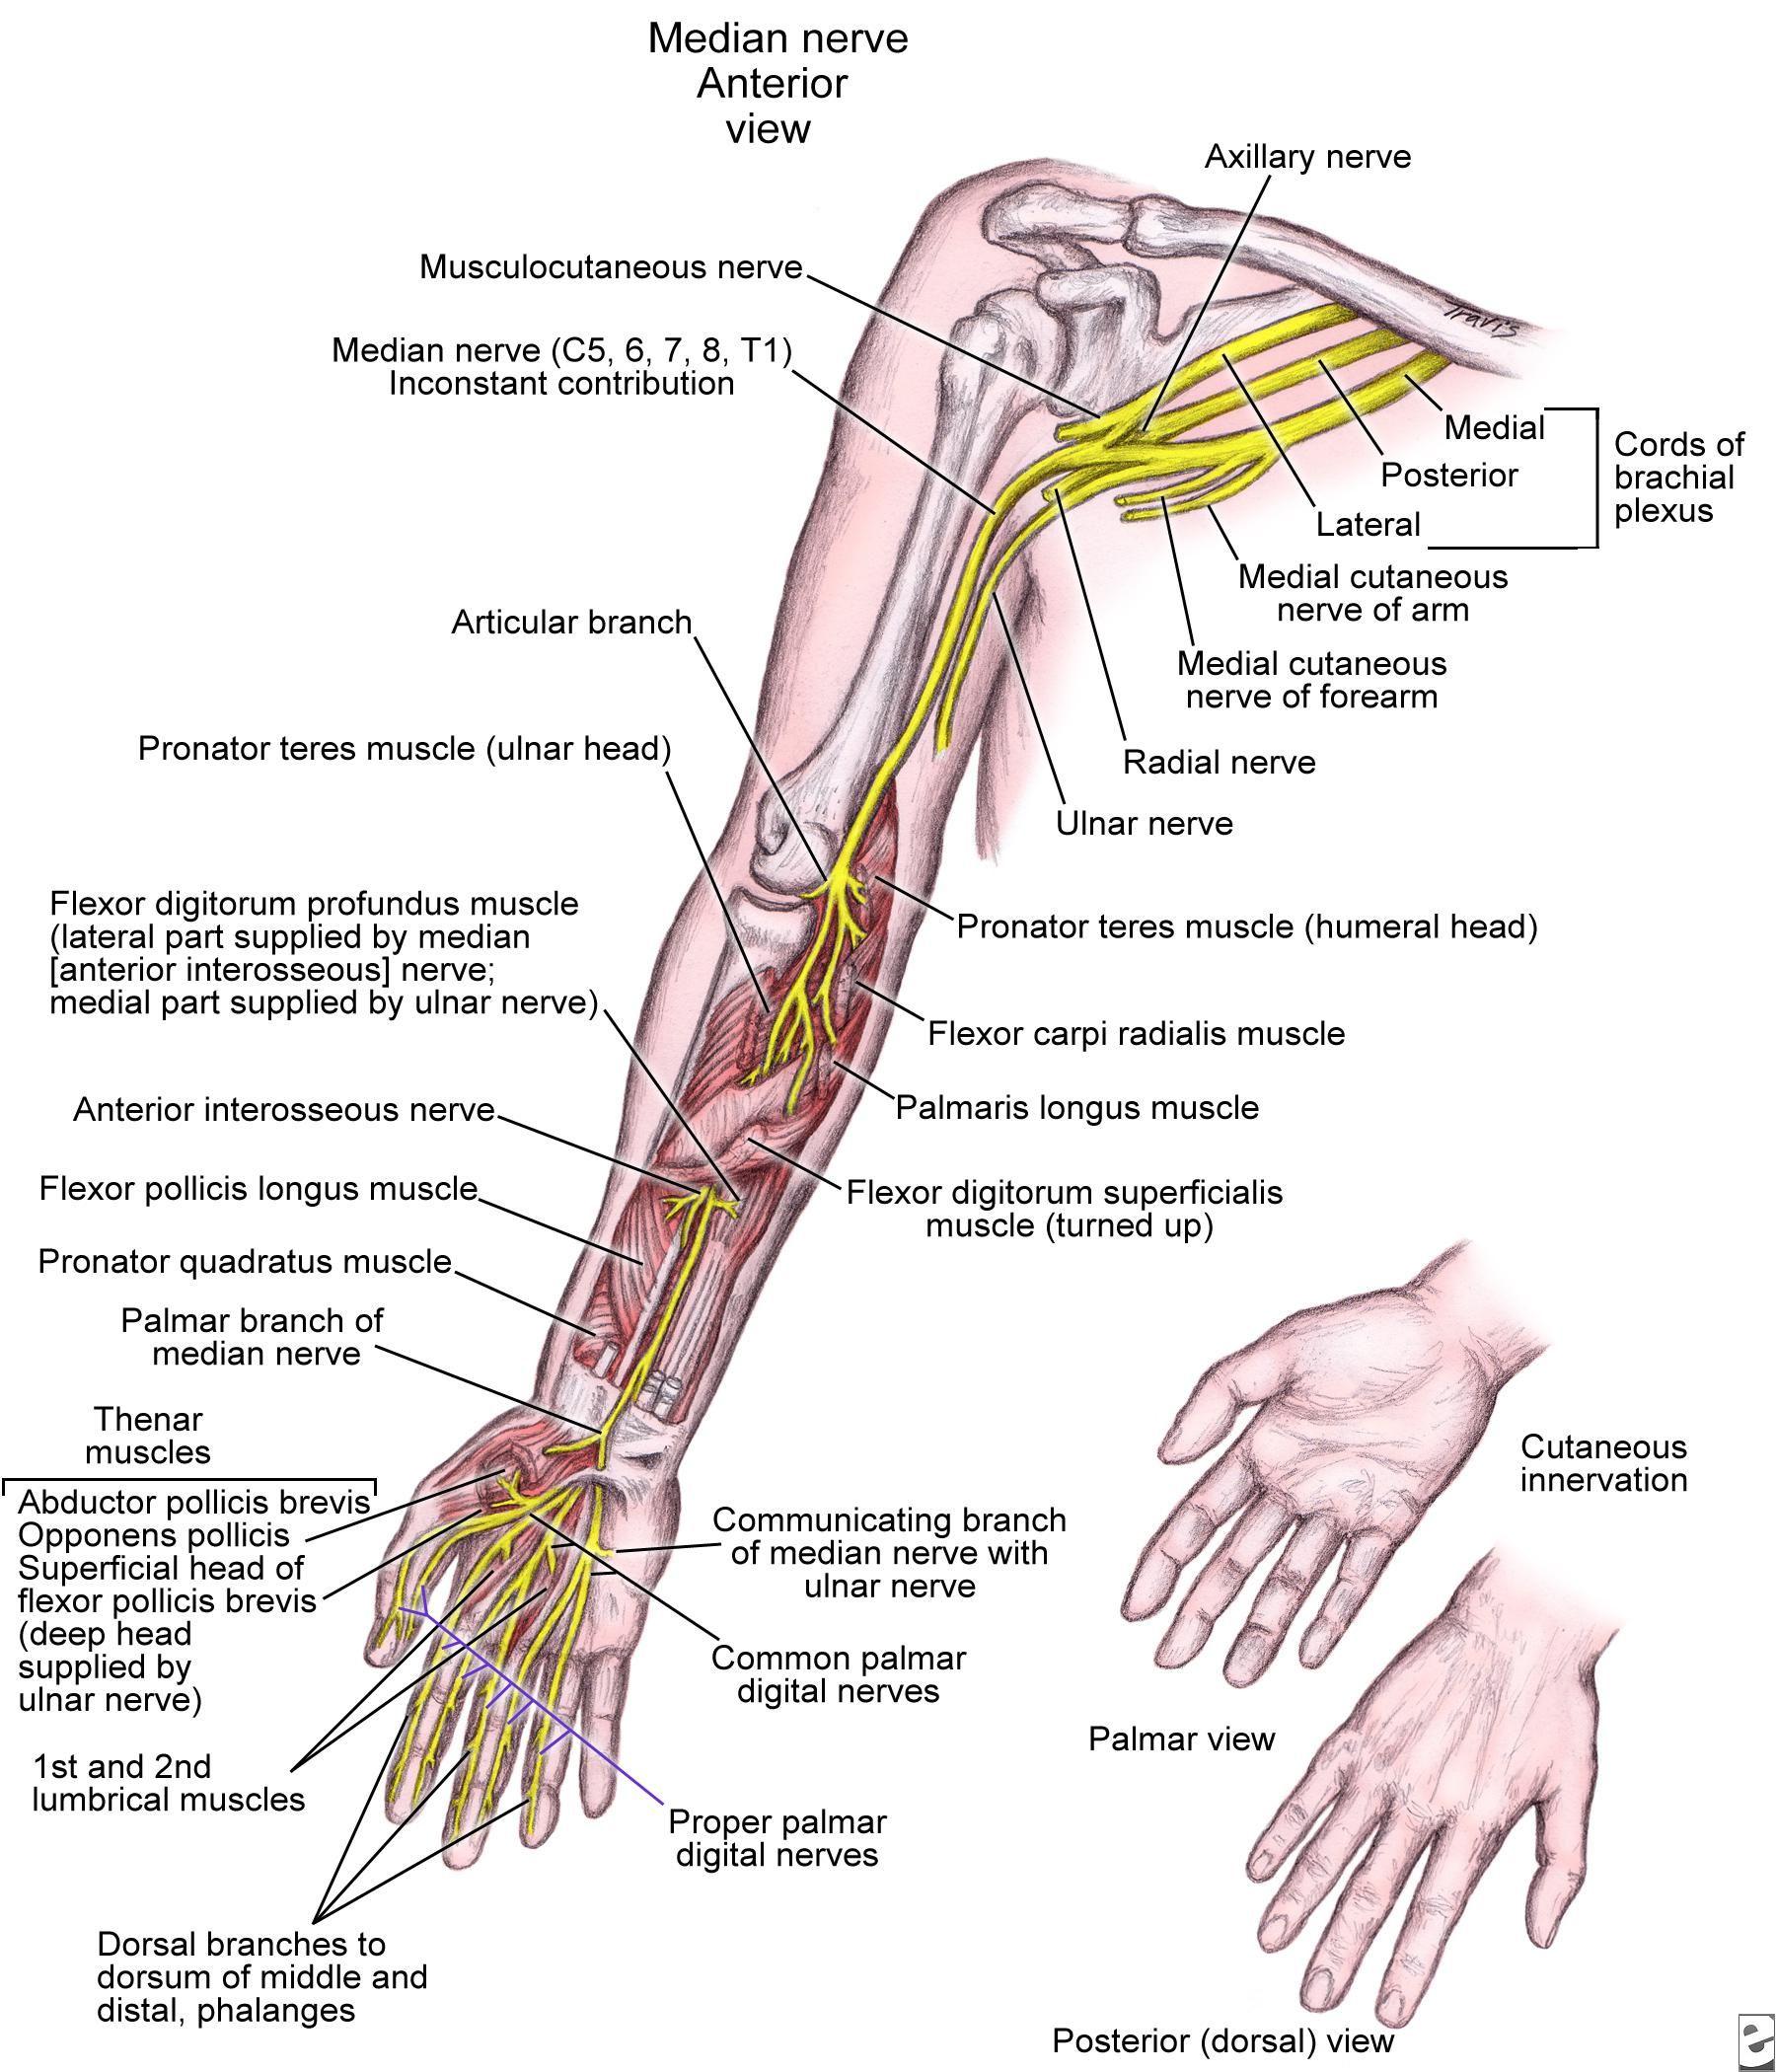 Pin by Sandeep on Upper Limb Anatomy | Pinterest | Upper limb anatomy